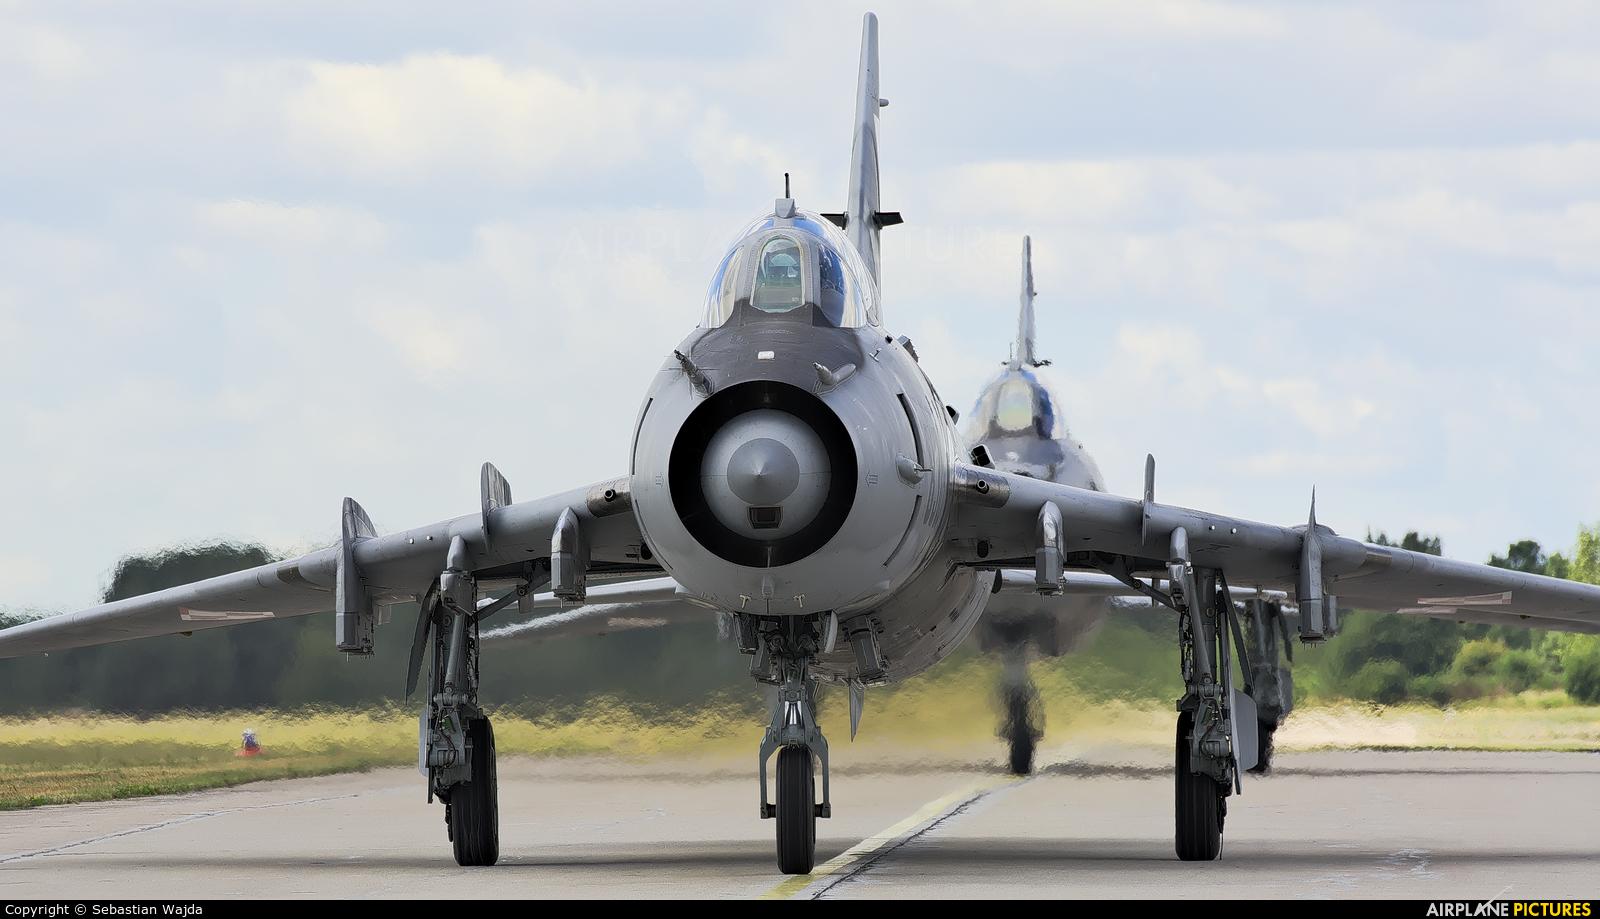 Poland - Air Force 8309 aircraft at Świdwin